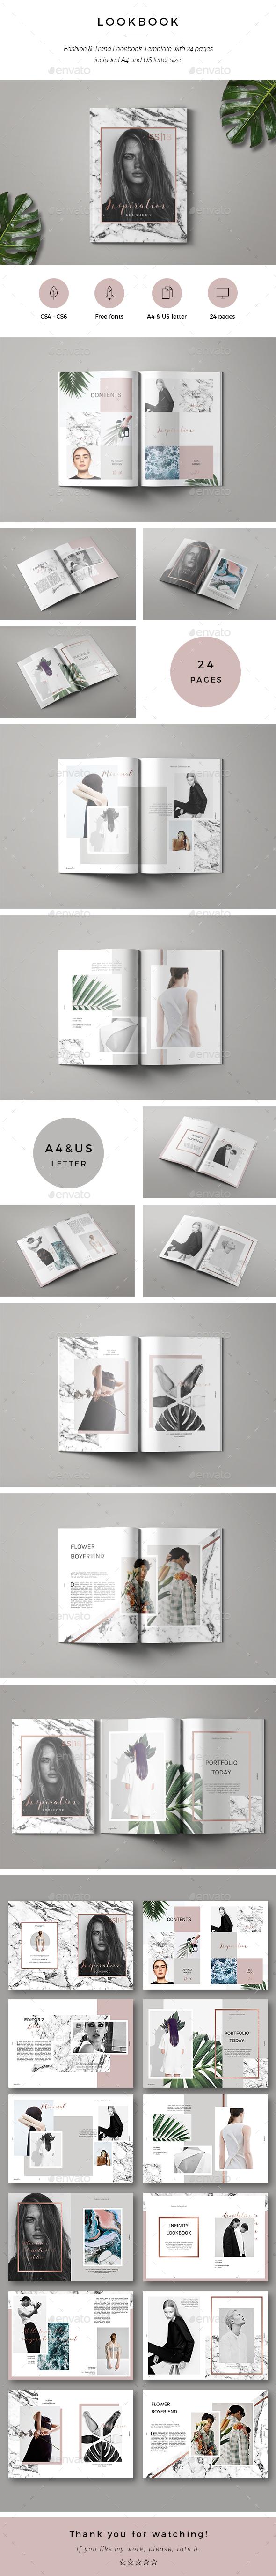 Inspiration Lookbook - Magazines Print Templates